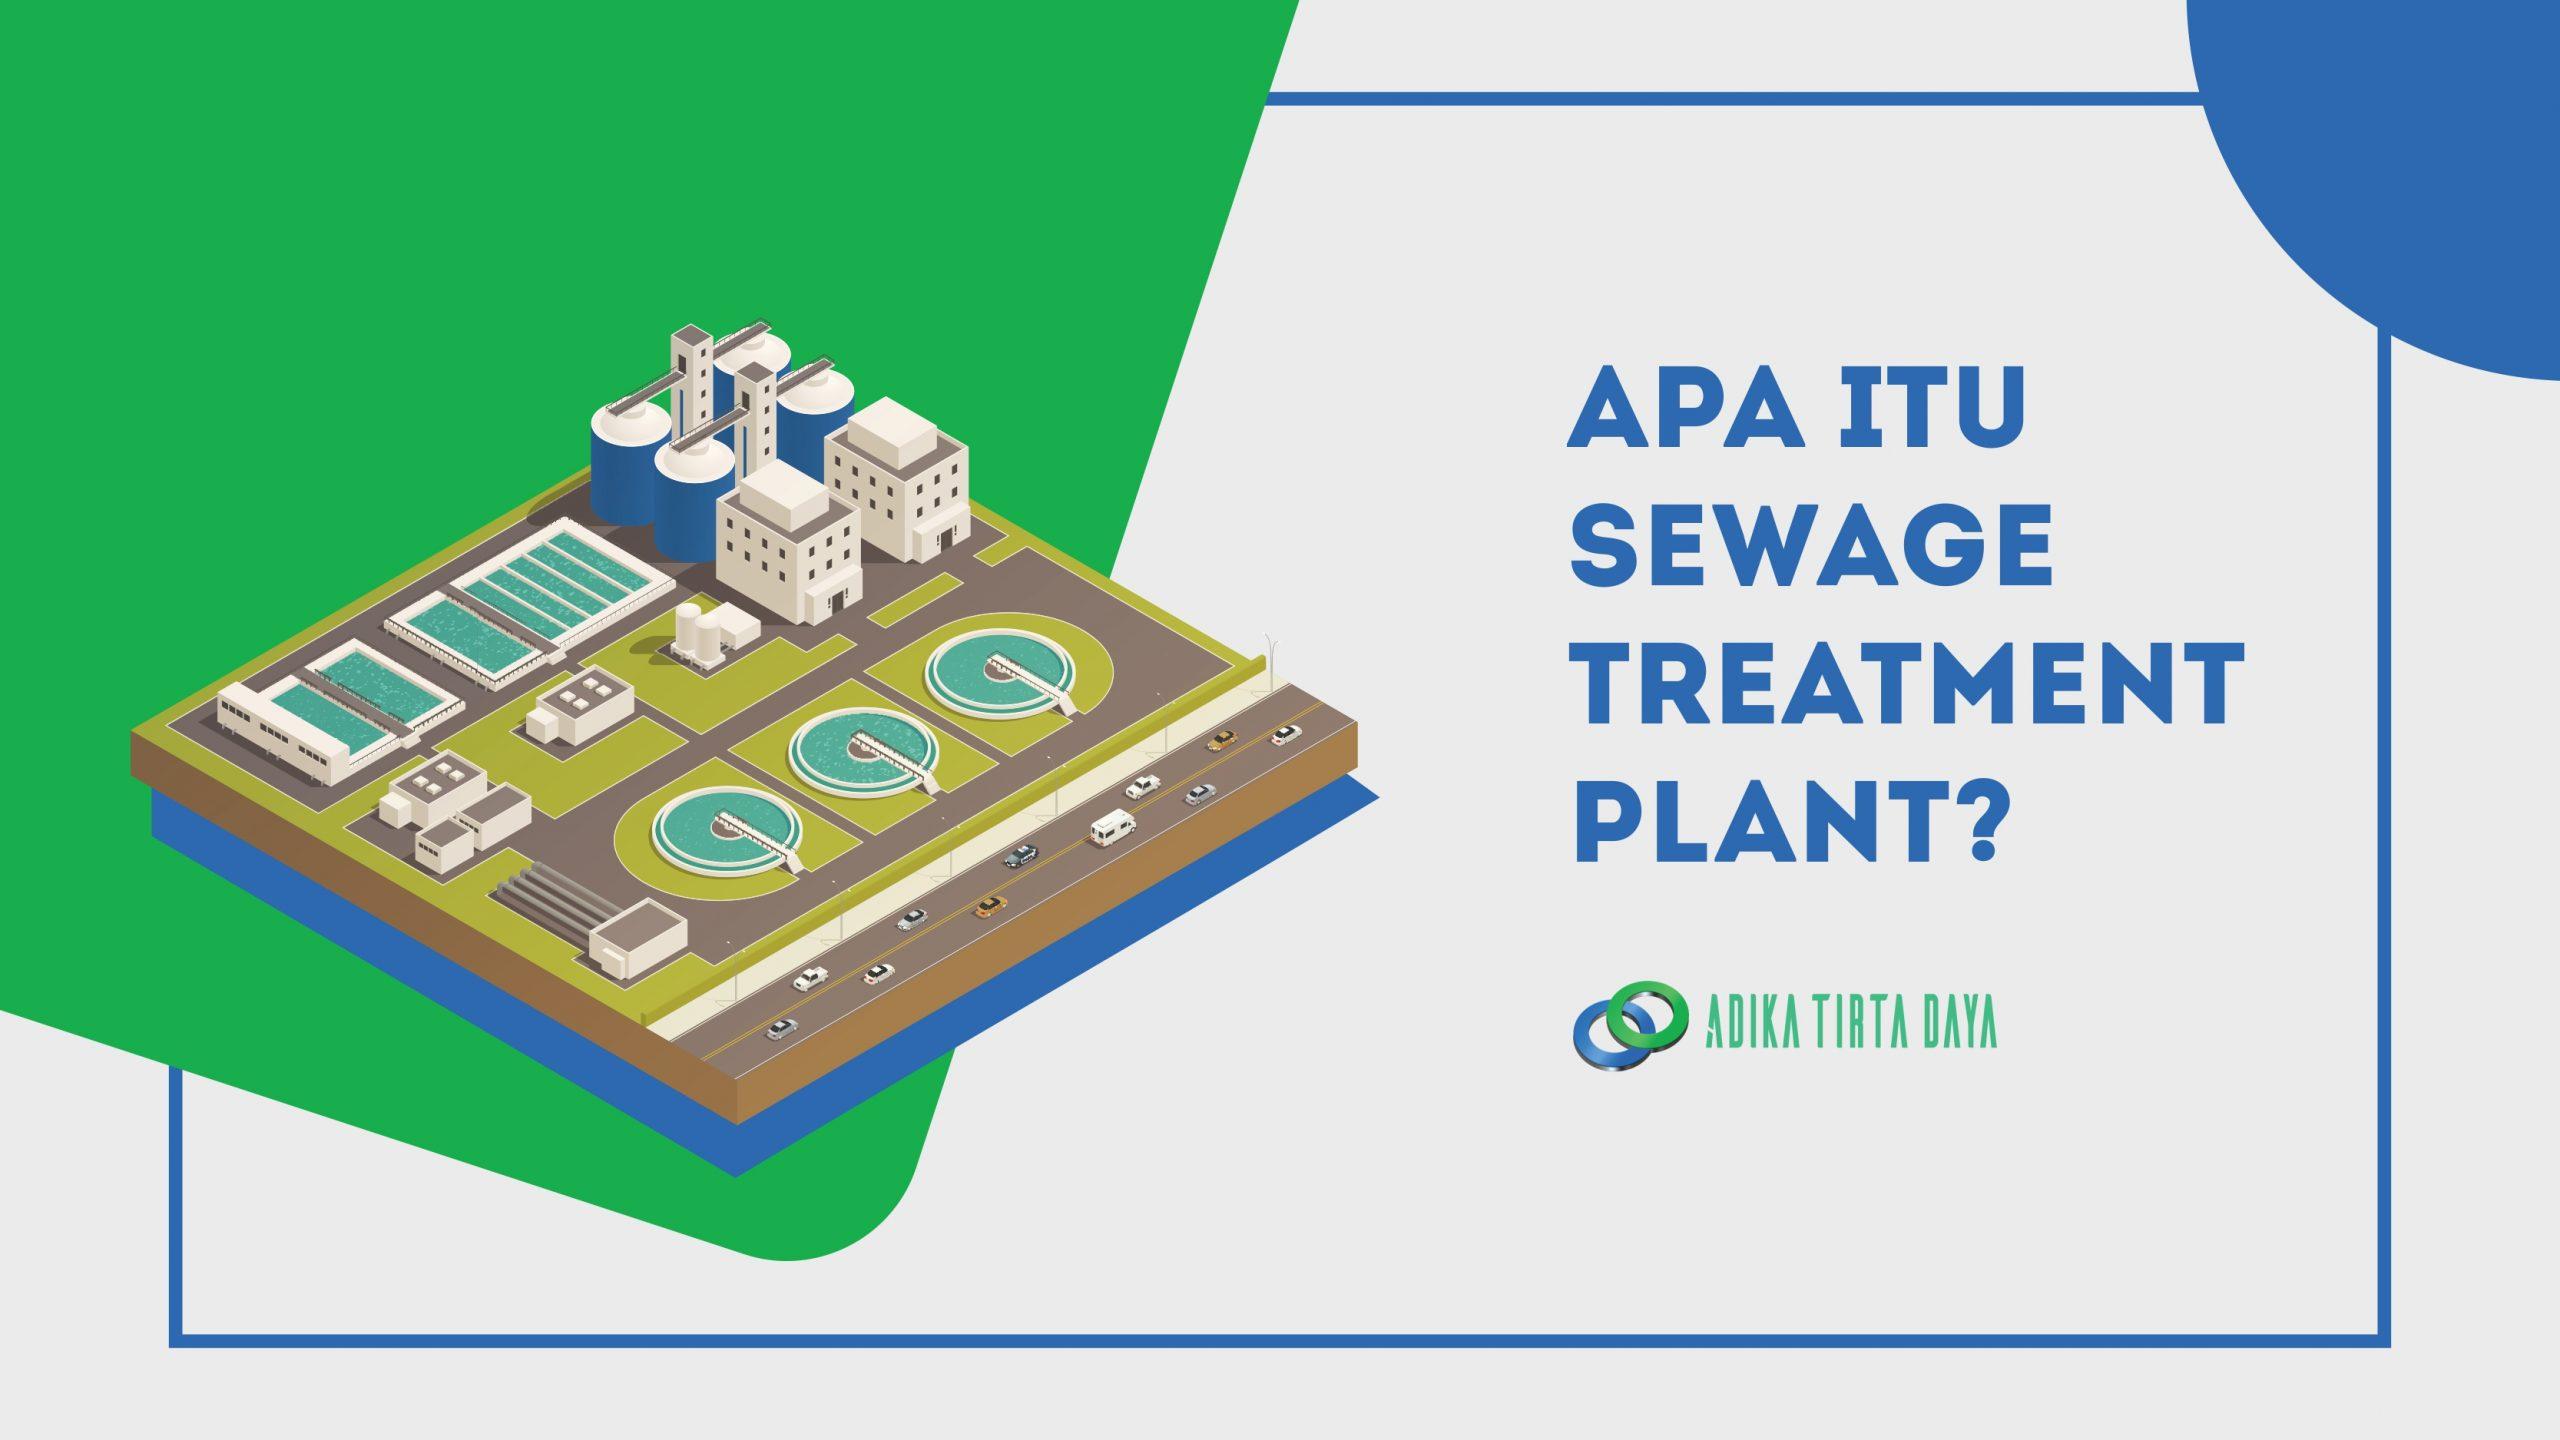 02_Apa-Itu-Sewage-Treatment-Plant